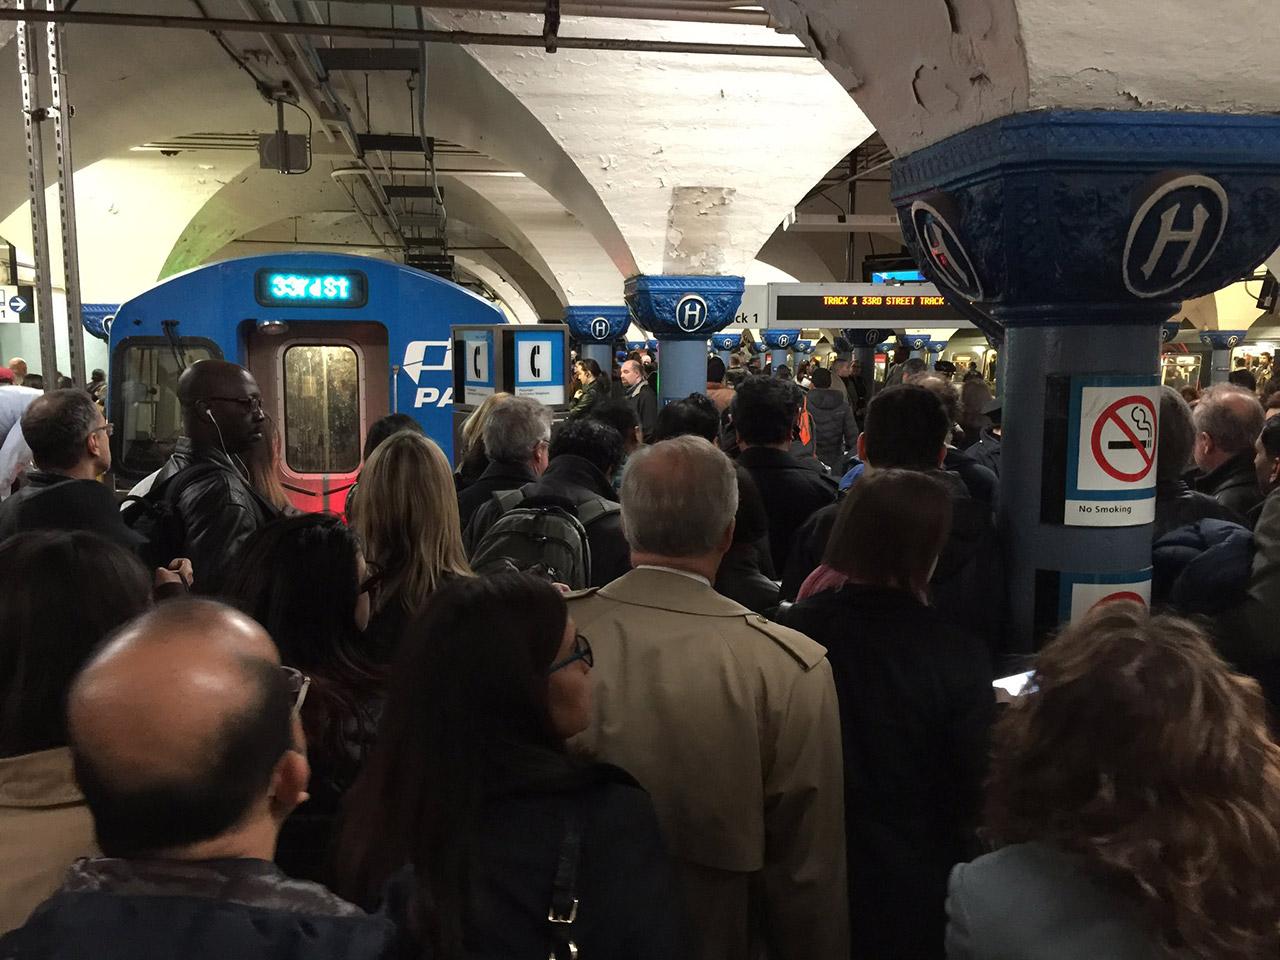 <div class='meta'><div class='origin-logo' data-origin='none'></div><span class='caption-text' data-credit='Photo/@robertjohndavis via Twitter'>This photo shows the crowds waiting for the PATH train in Hoboken following a derailment at New York Penn Station on Monday, April 3, 2017.</span></div>